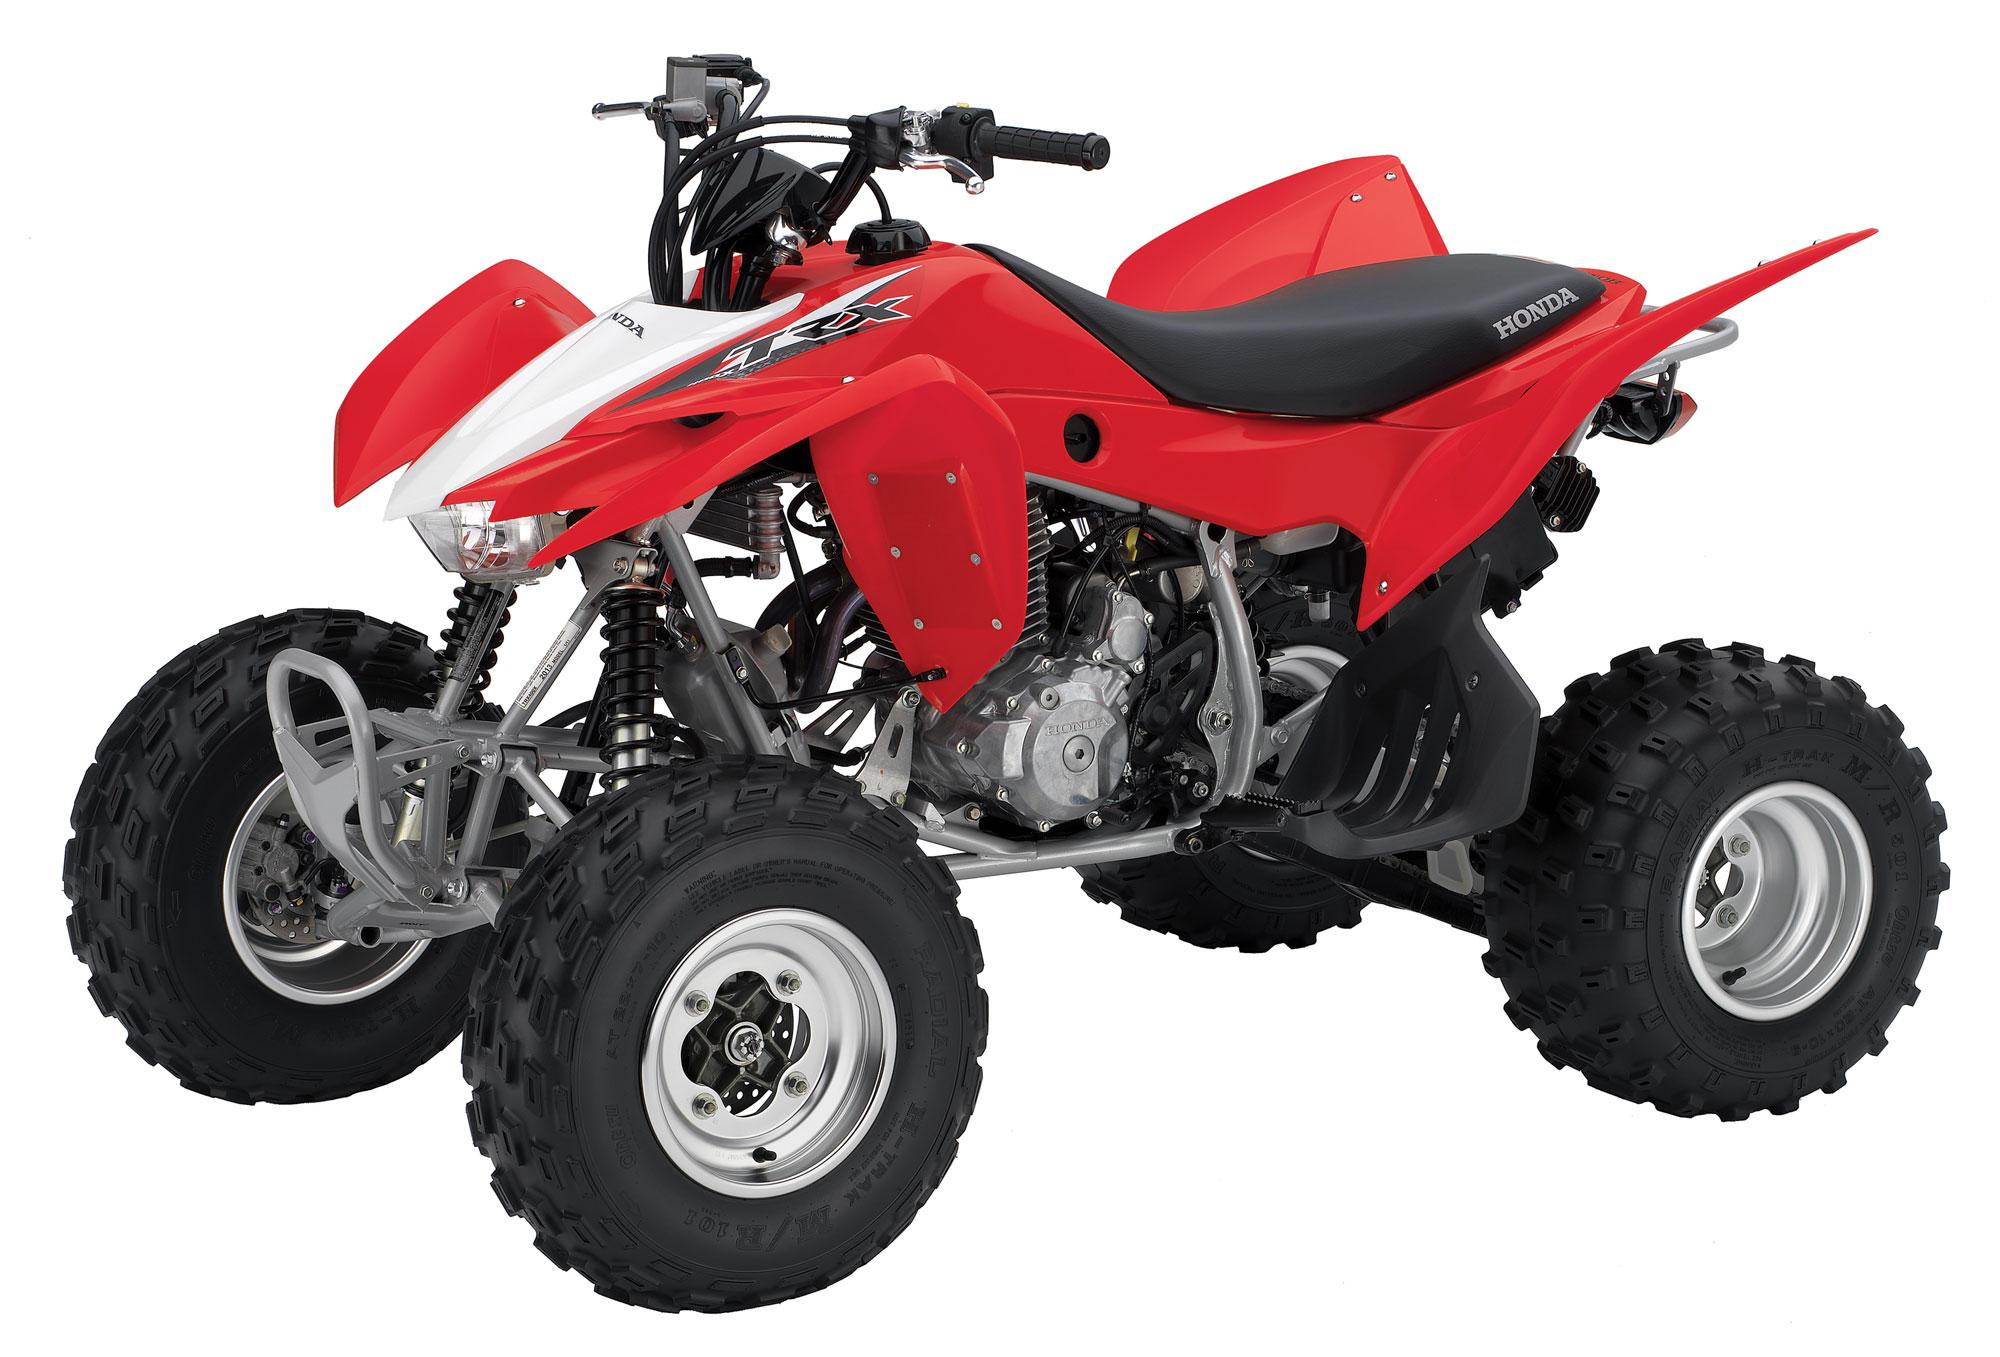 квадроцикл хонда 400 технические характеристики